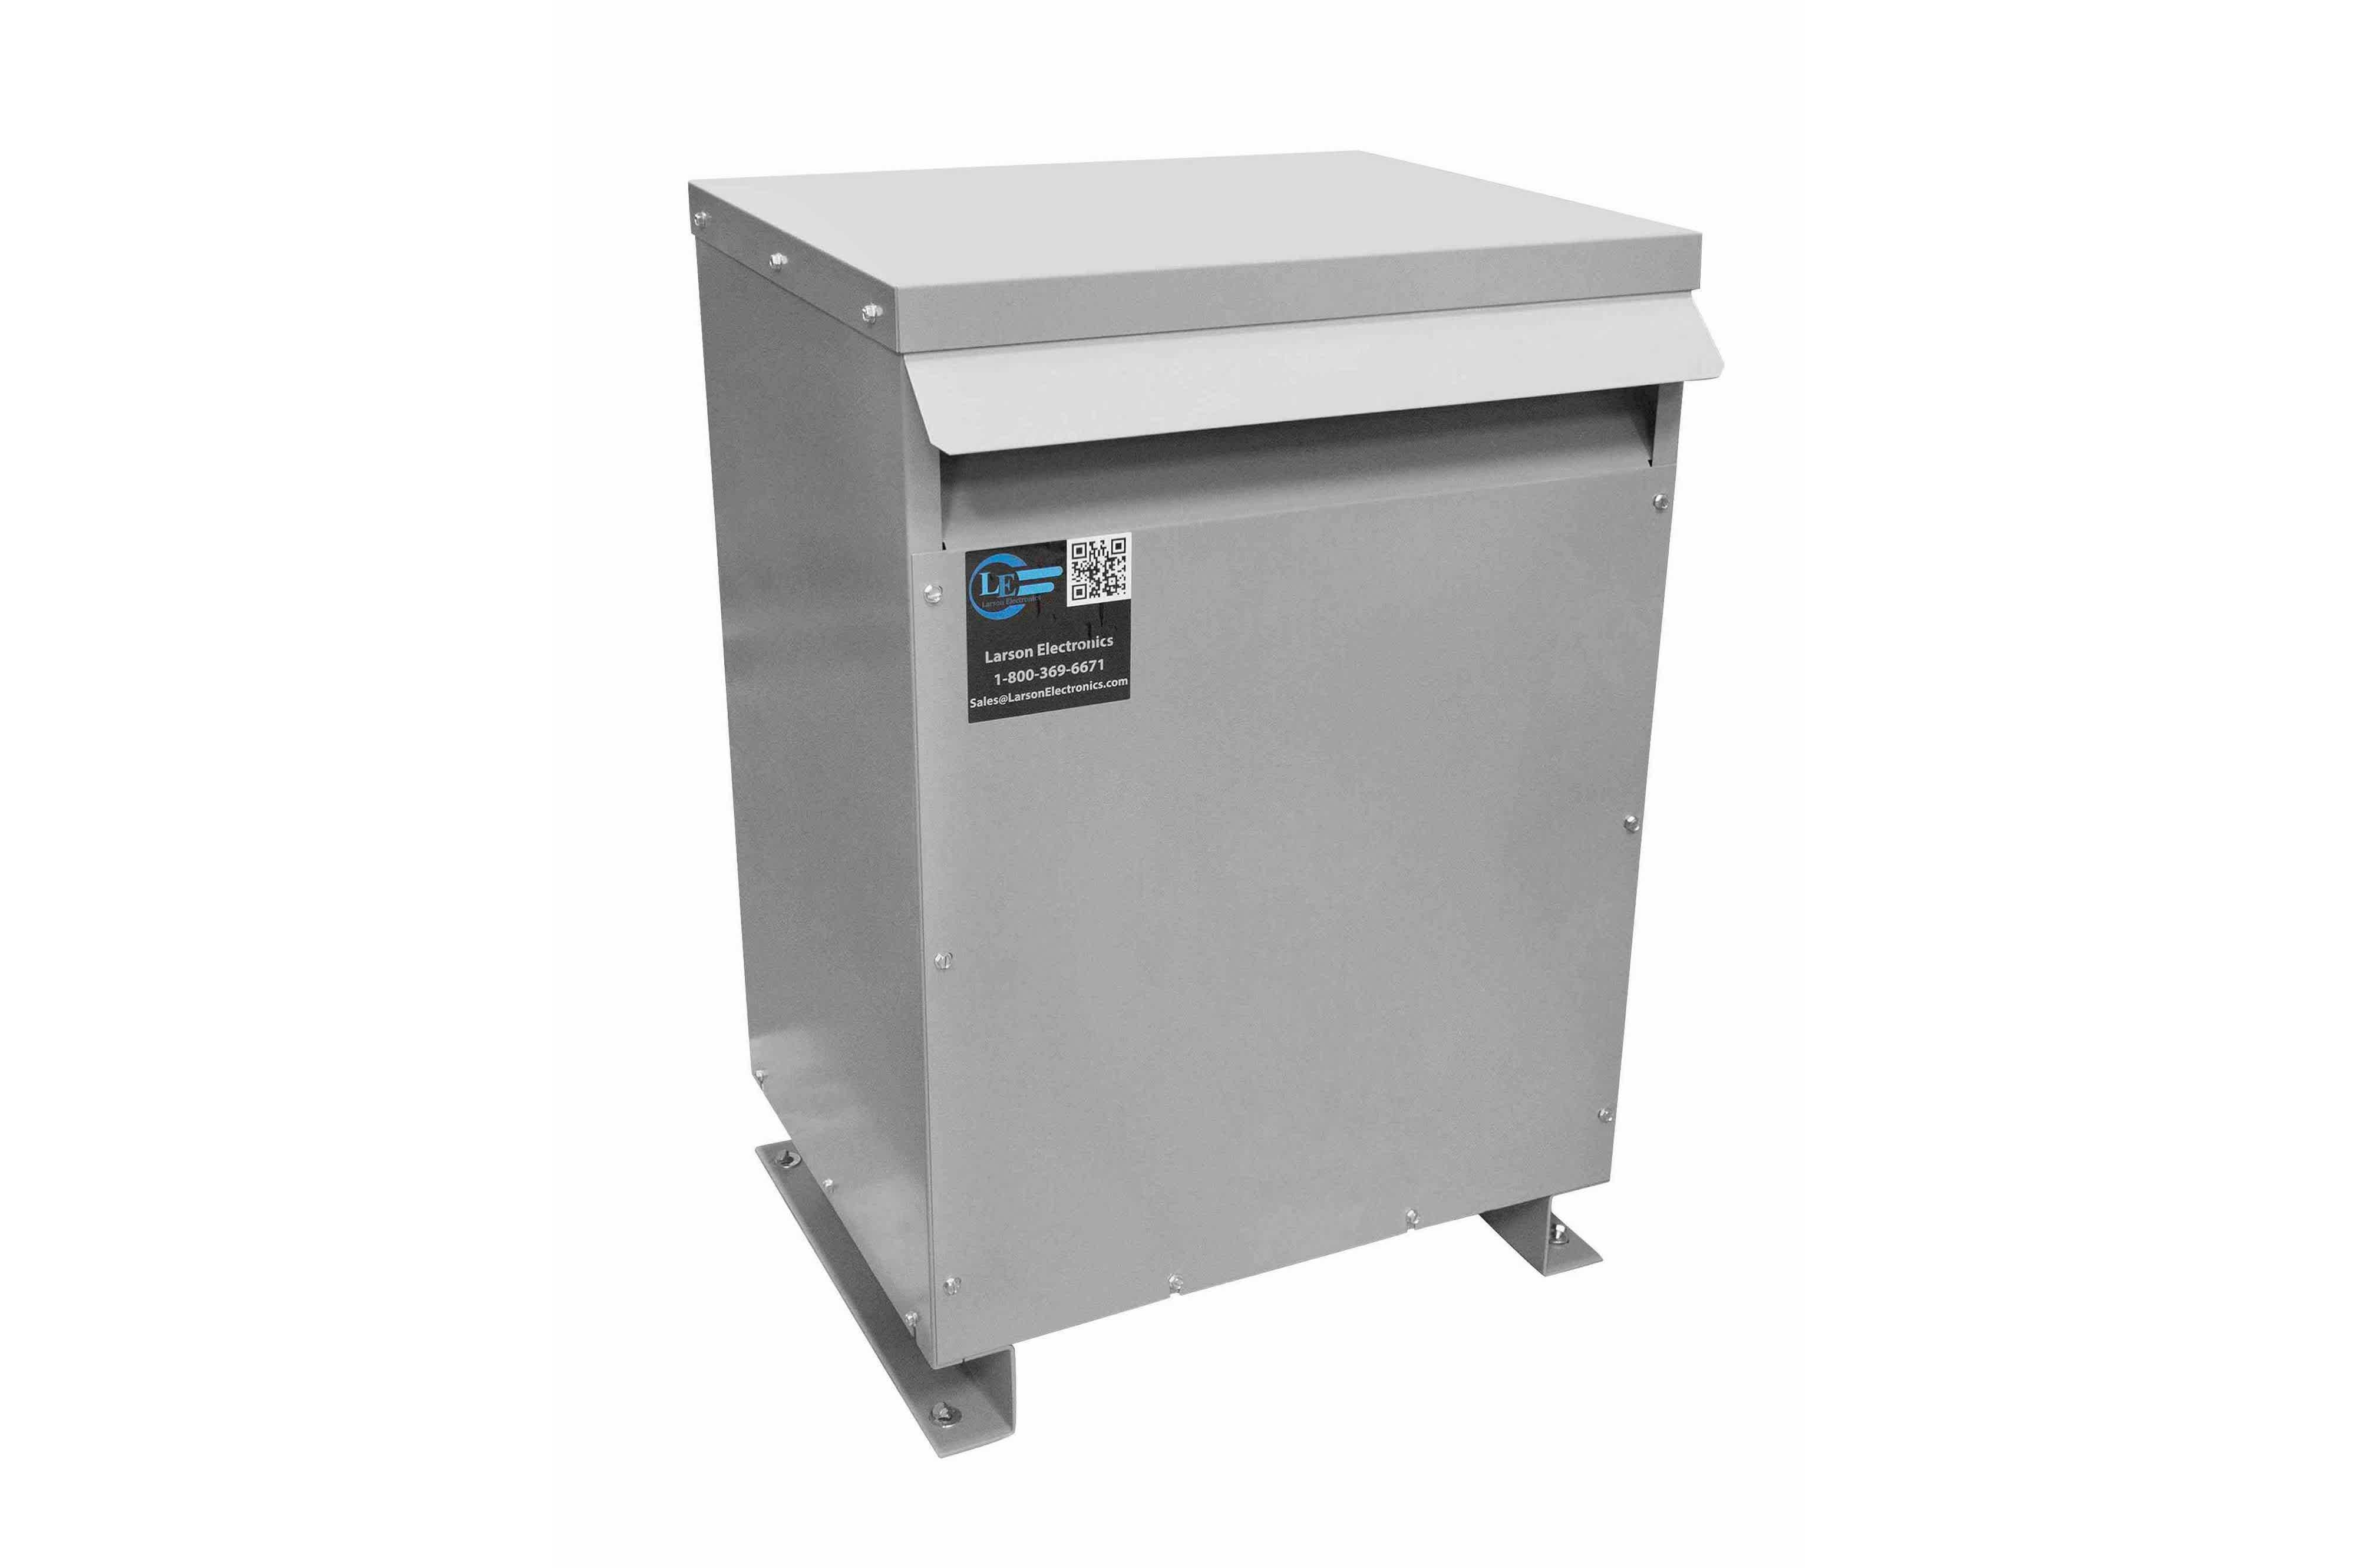 167 kVA 3PH Isolation Transformer, 208V Wye Primary, 480V Delta Secondary, N3R, Ventilated, 60 Hz